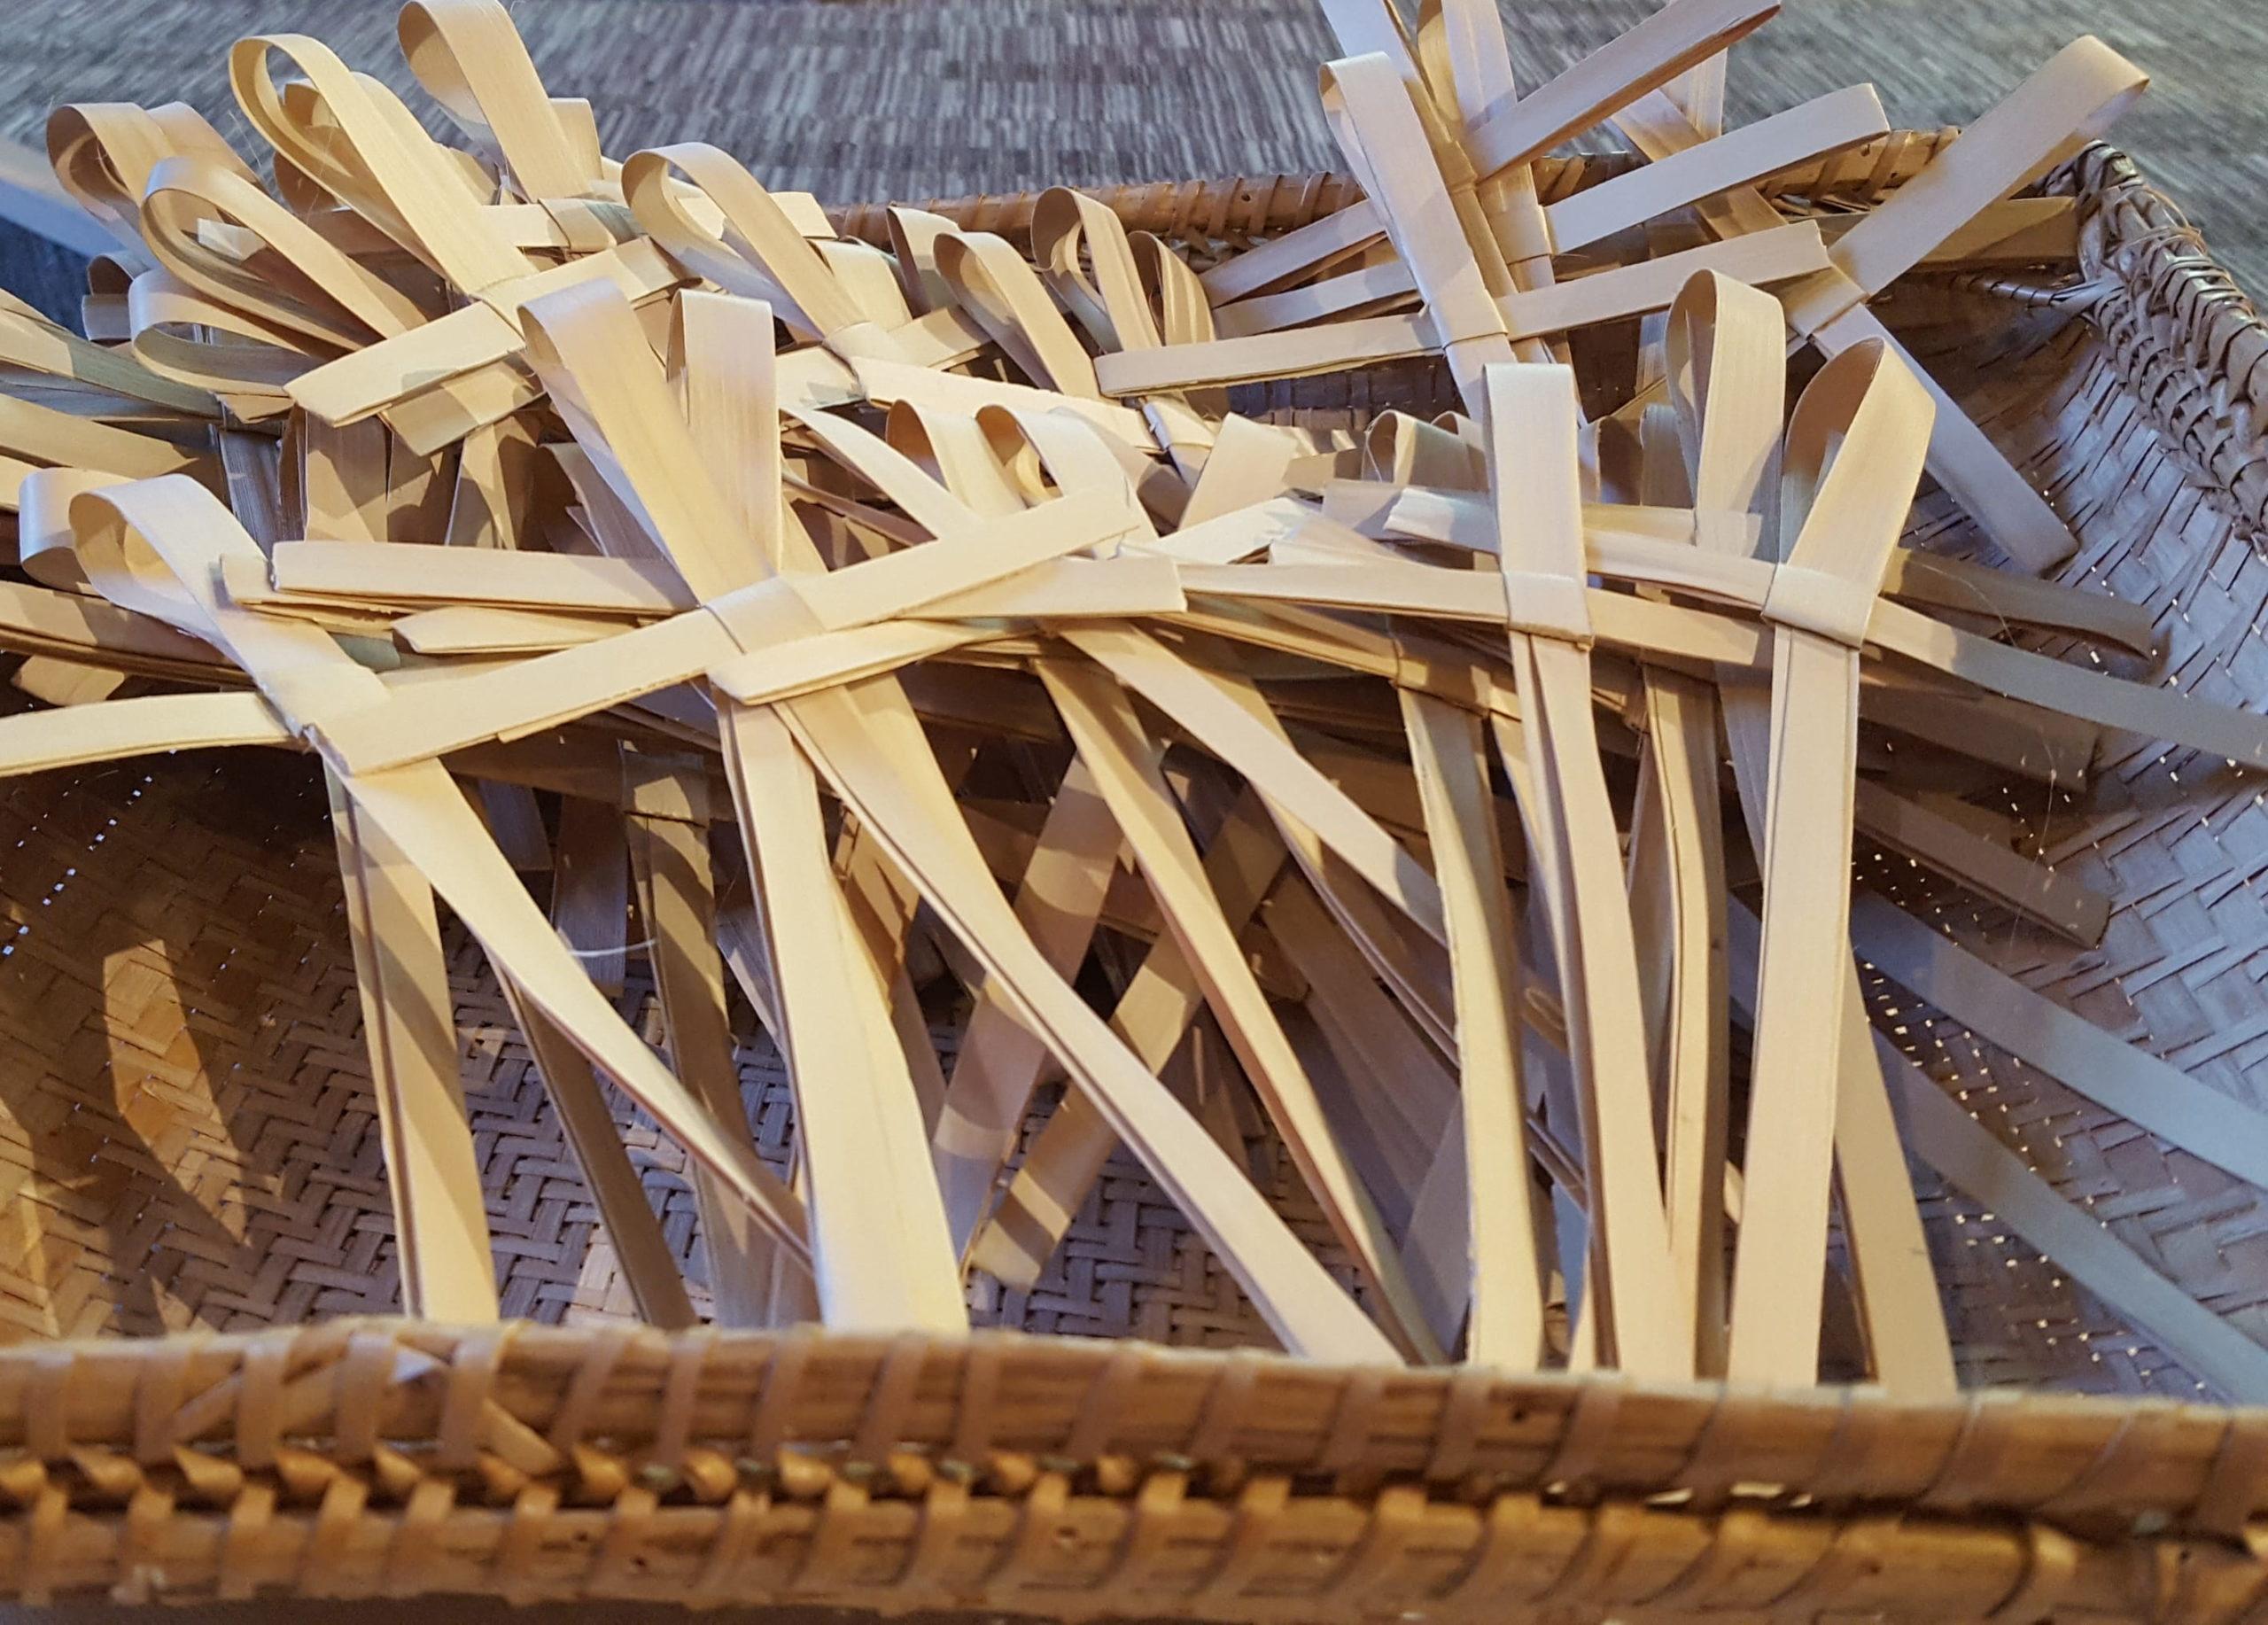 Palm crosses